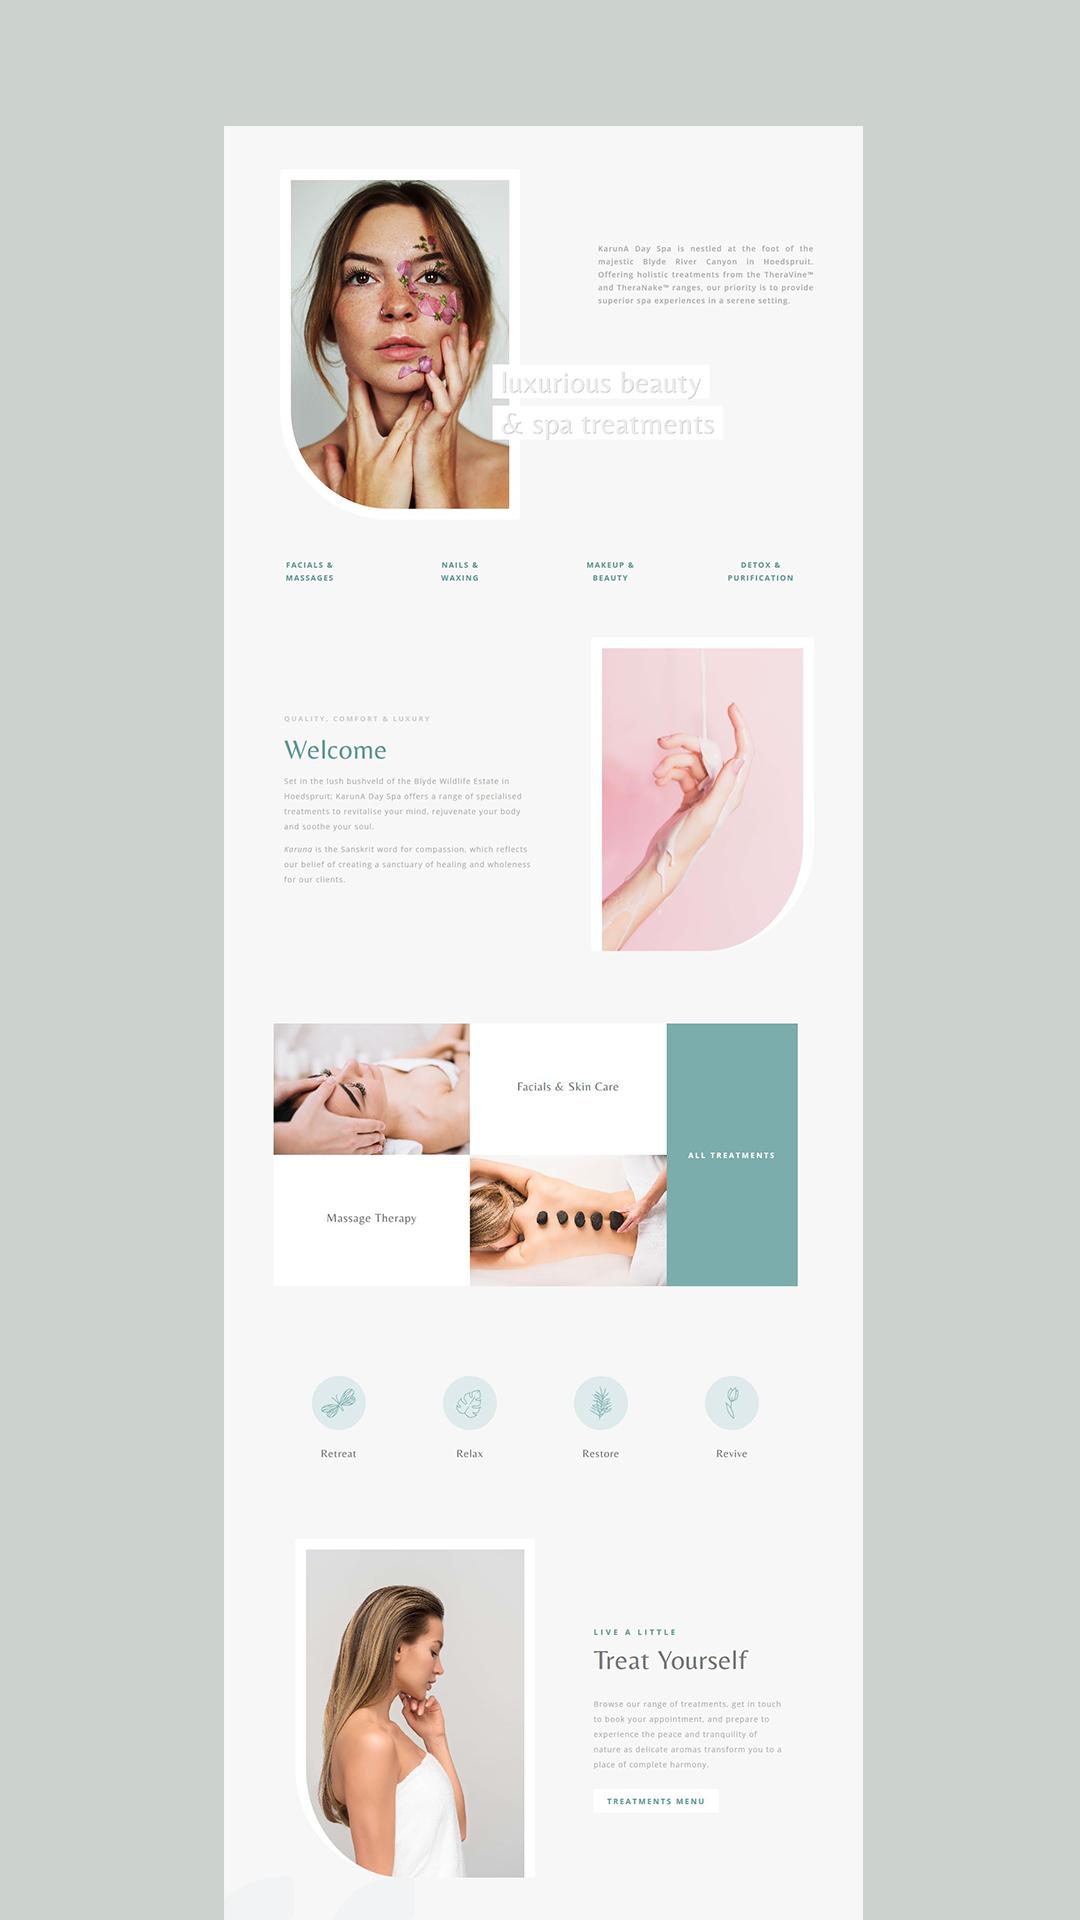 Minimalist Web Design In 2020 Minimalist Web Design Medical Website Design Minimal Web Design